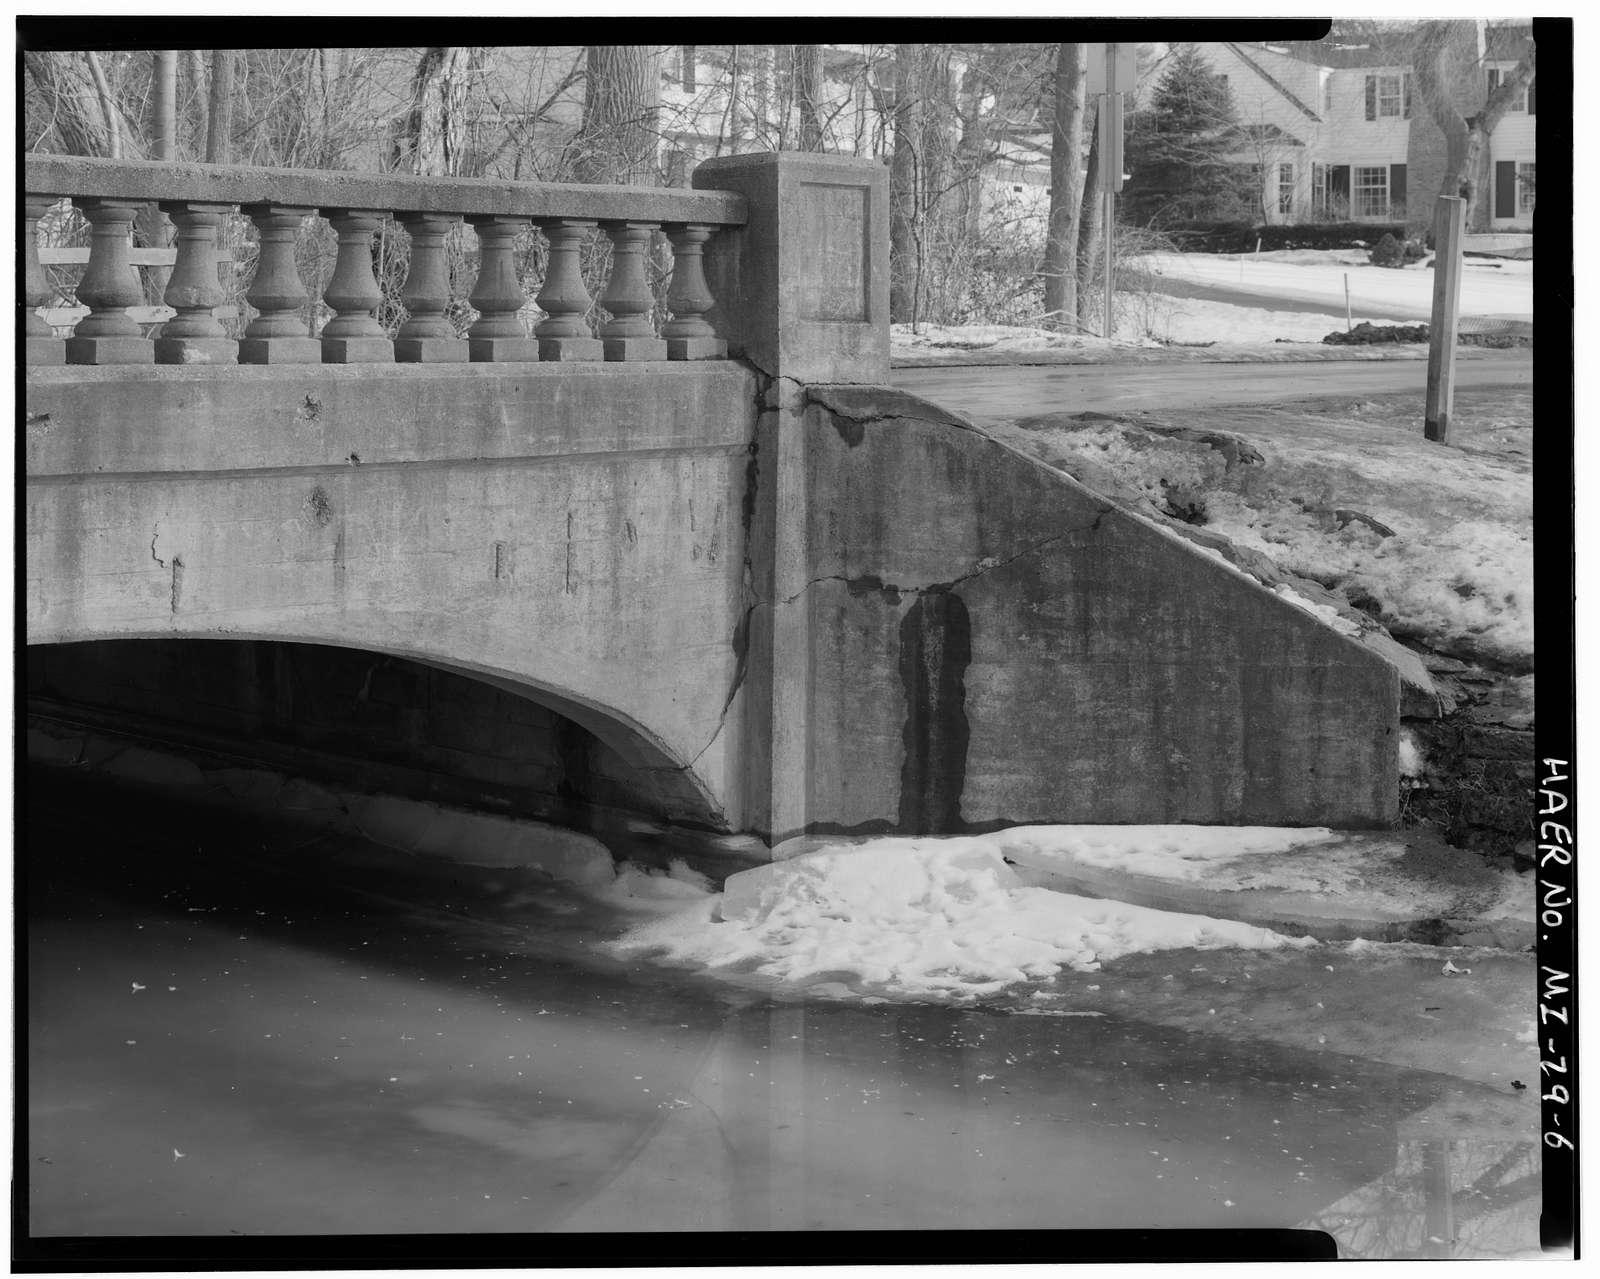 South Bridge, Spanning Quarton Lake branch of River Rouge, Birmingham, Oakland County, MI